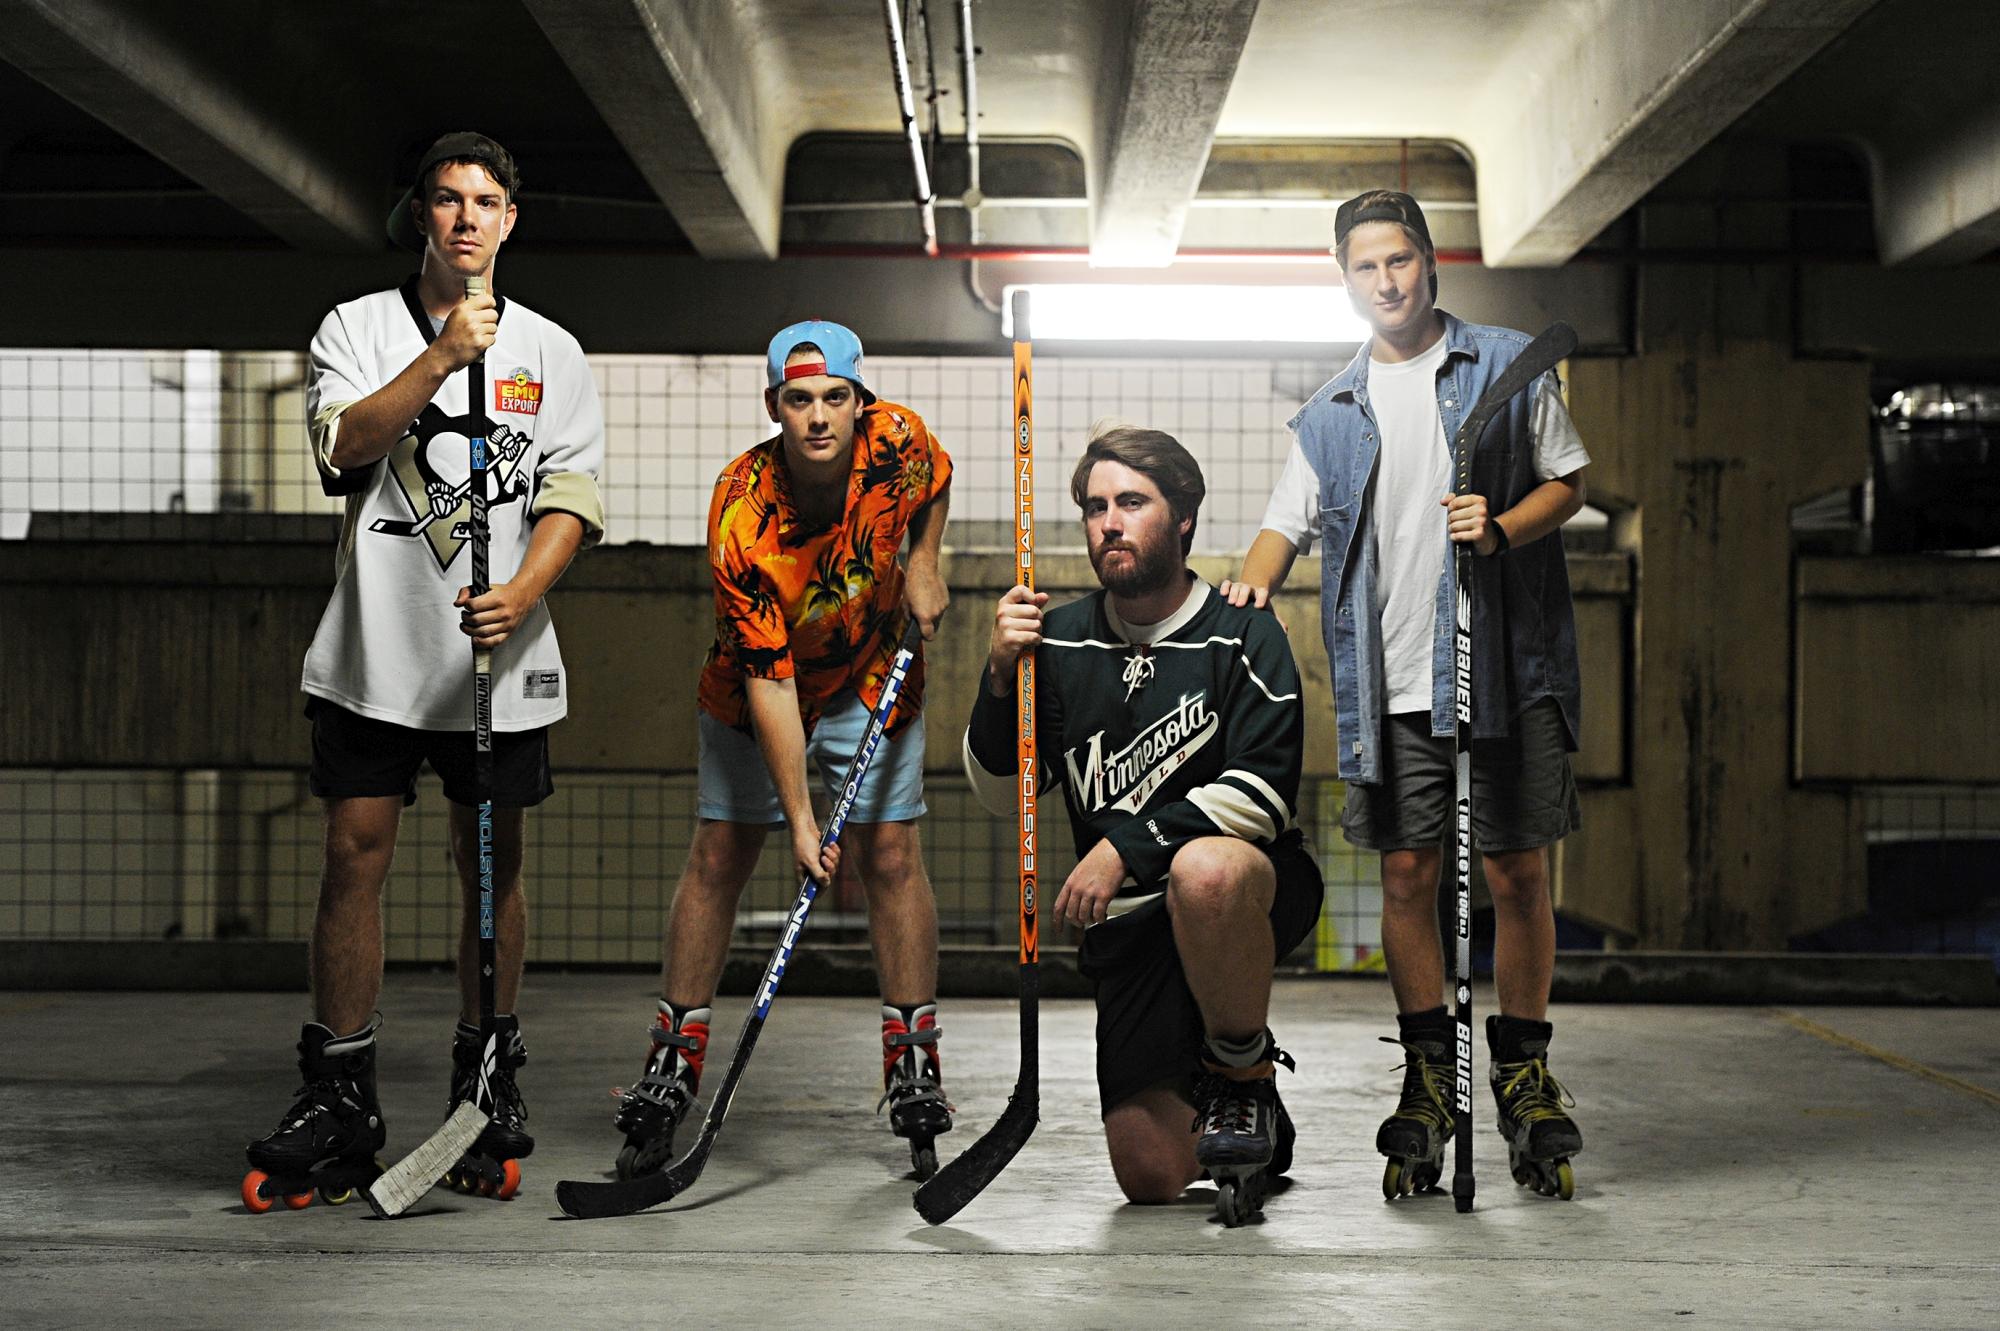 Street hockey players David Whitehouse, James Dixon, Eamonn Lourey and Ross Palchak. Photographer: Marcus Whisson